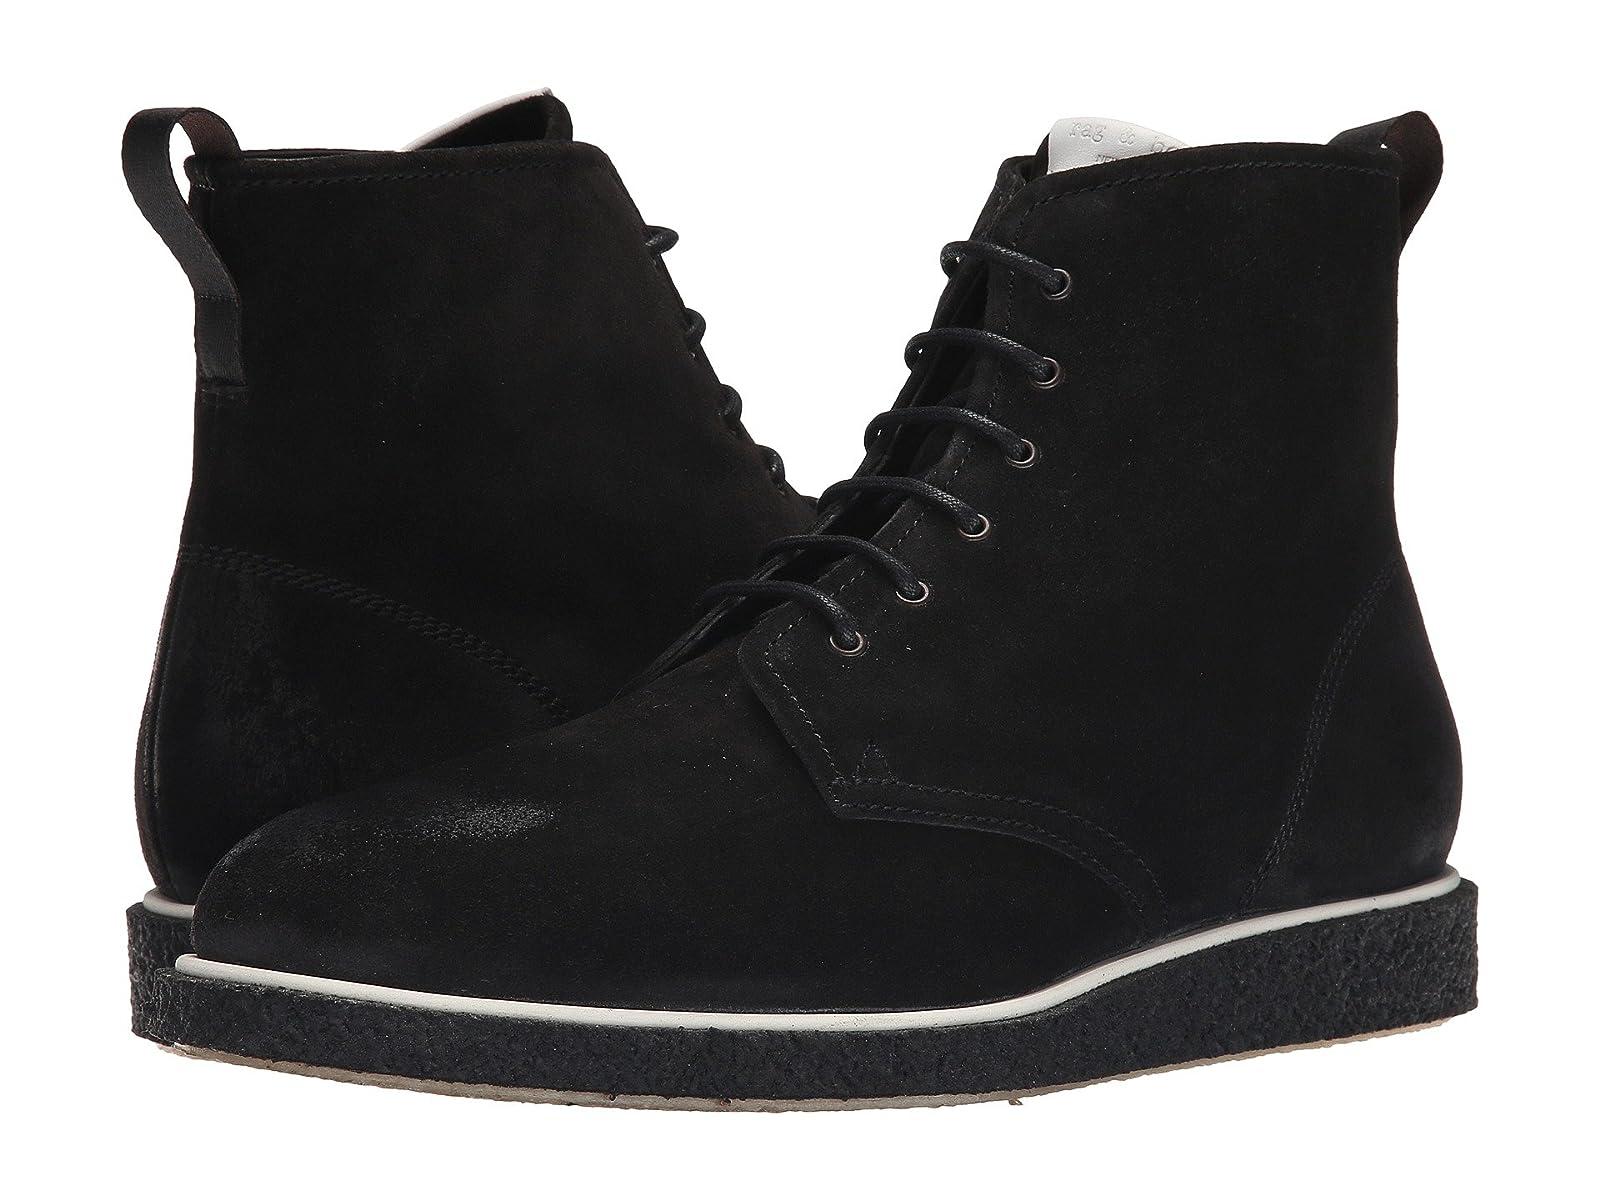 rag & bone Elliot Lace BootCheap and distinctive eye-catching shoes